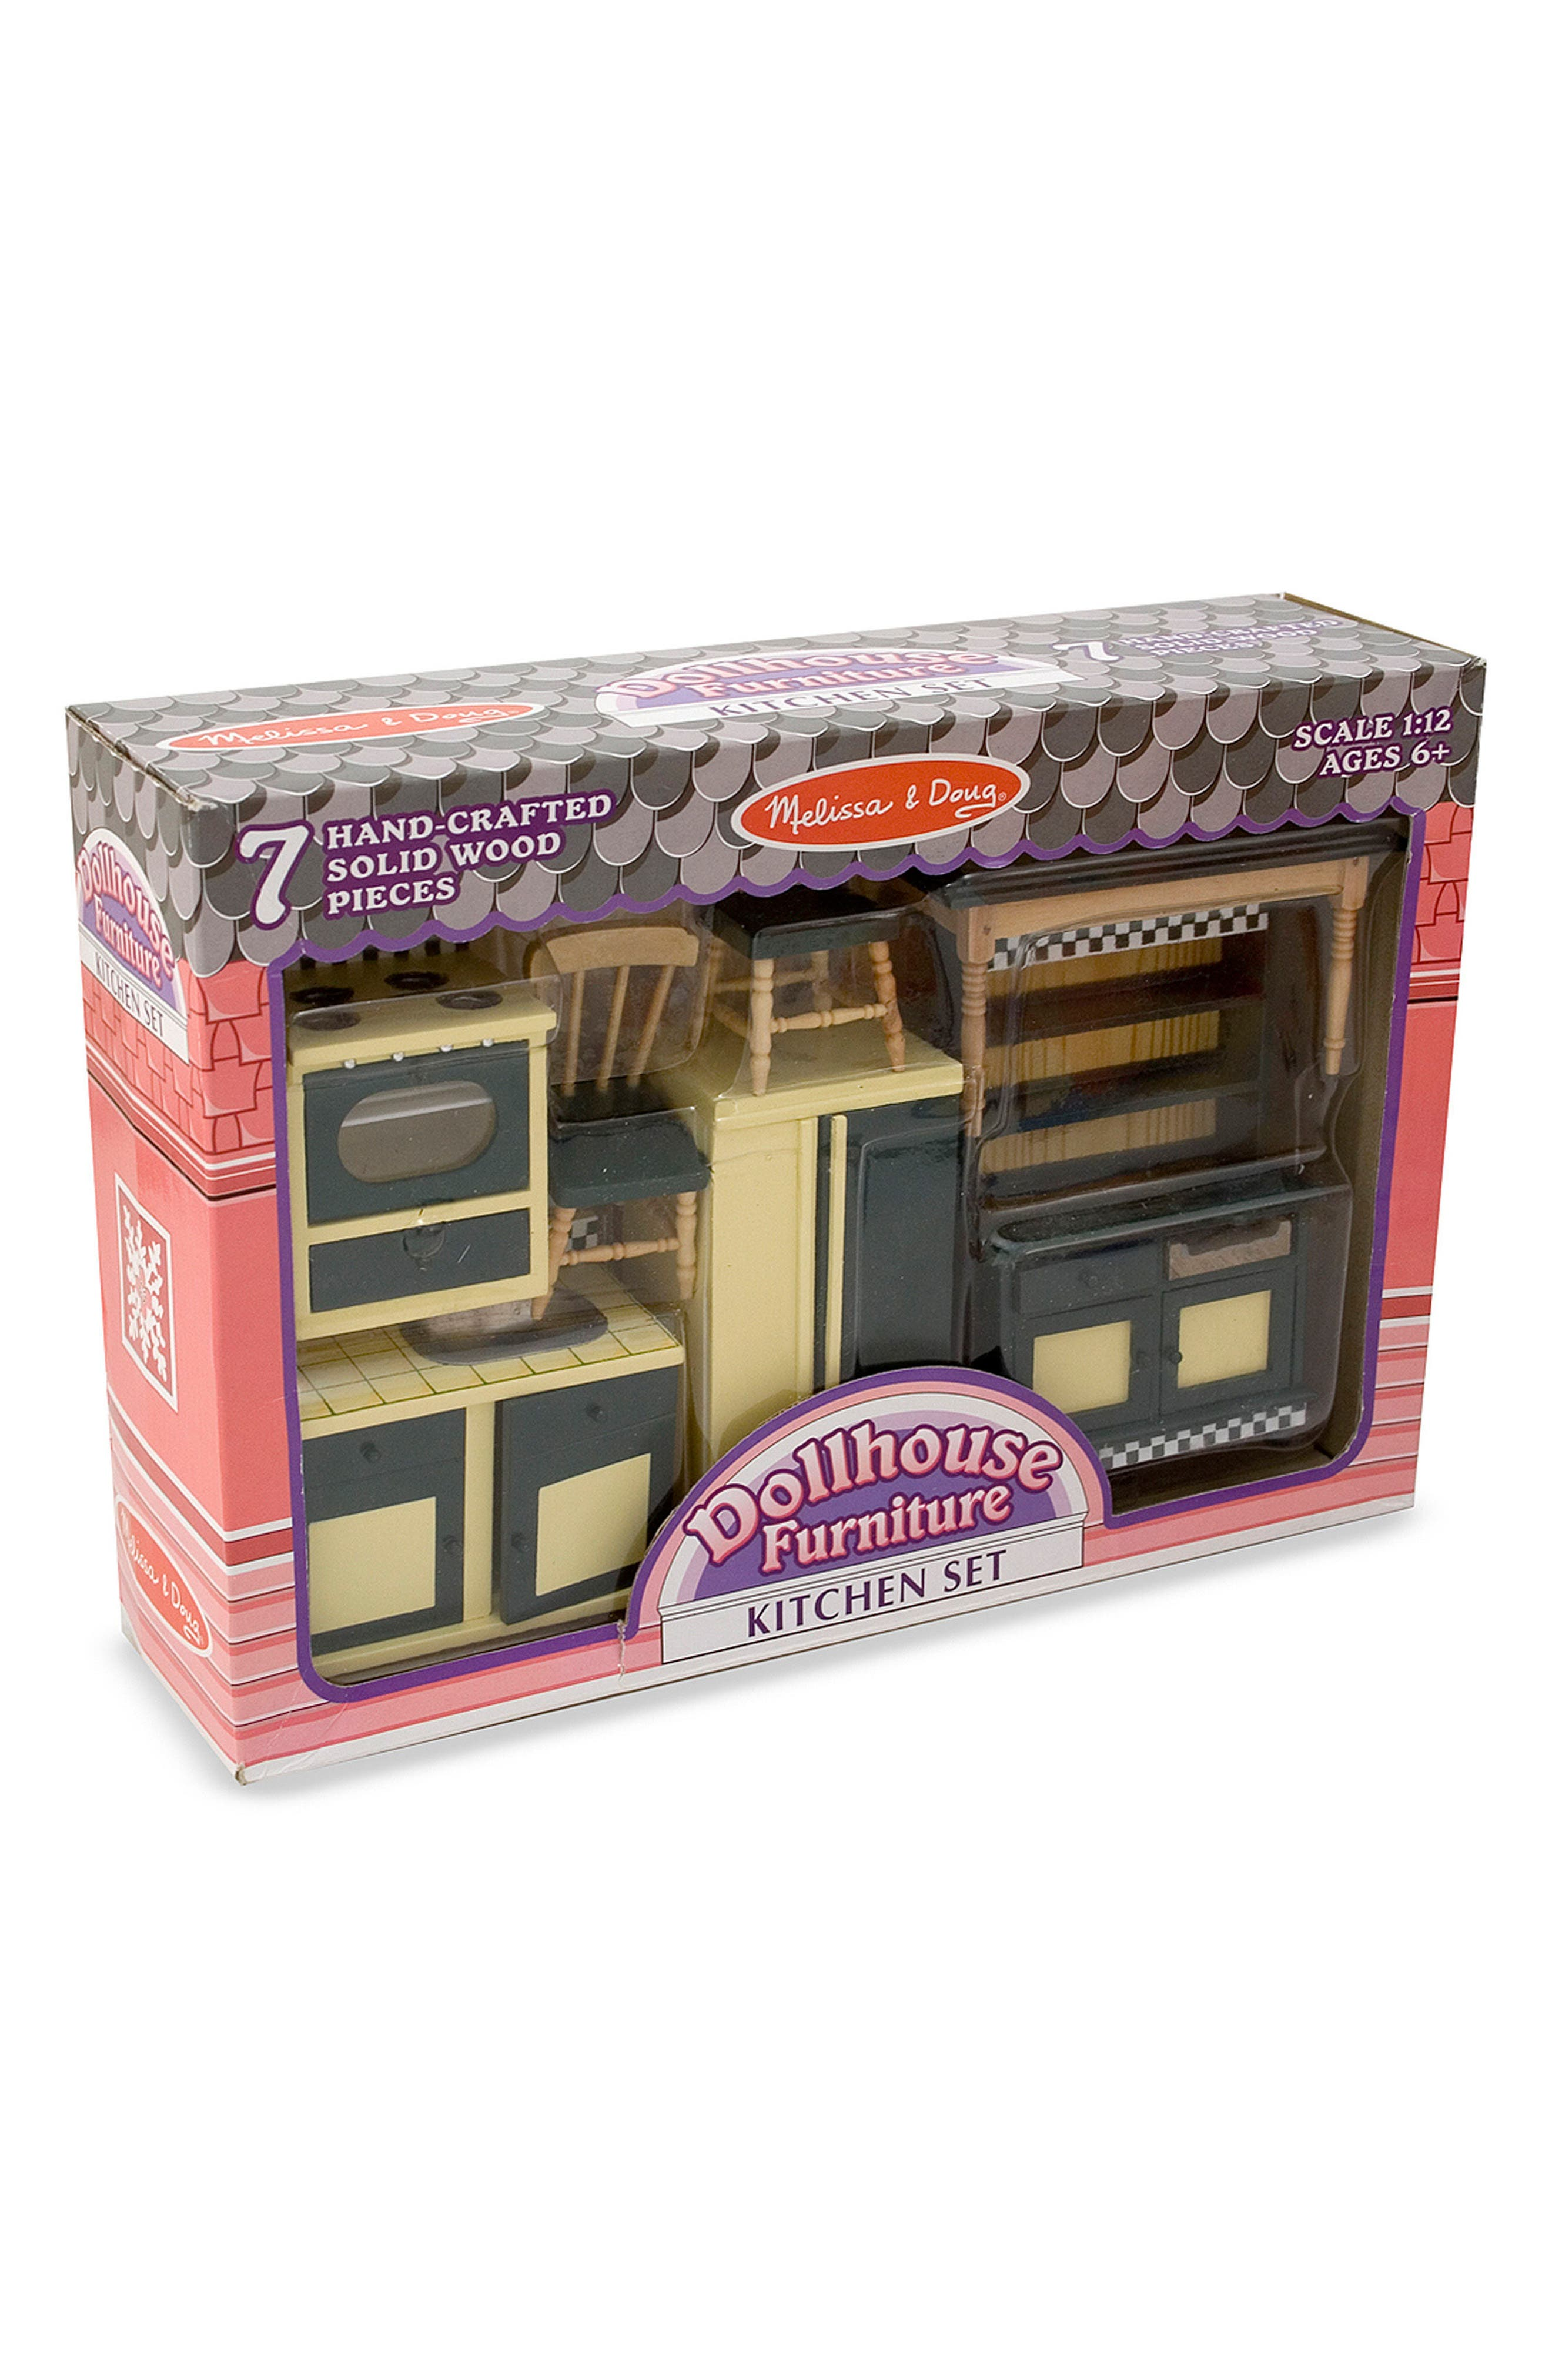 MELISSA & DOUG Dollhouse Furniture